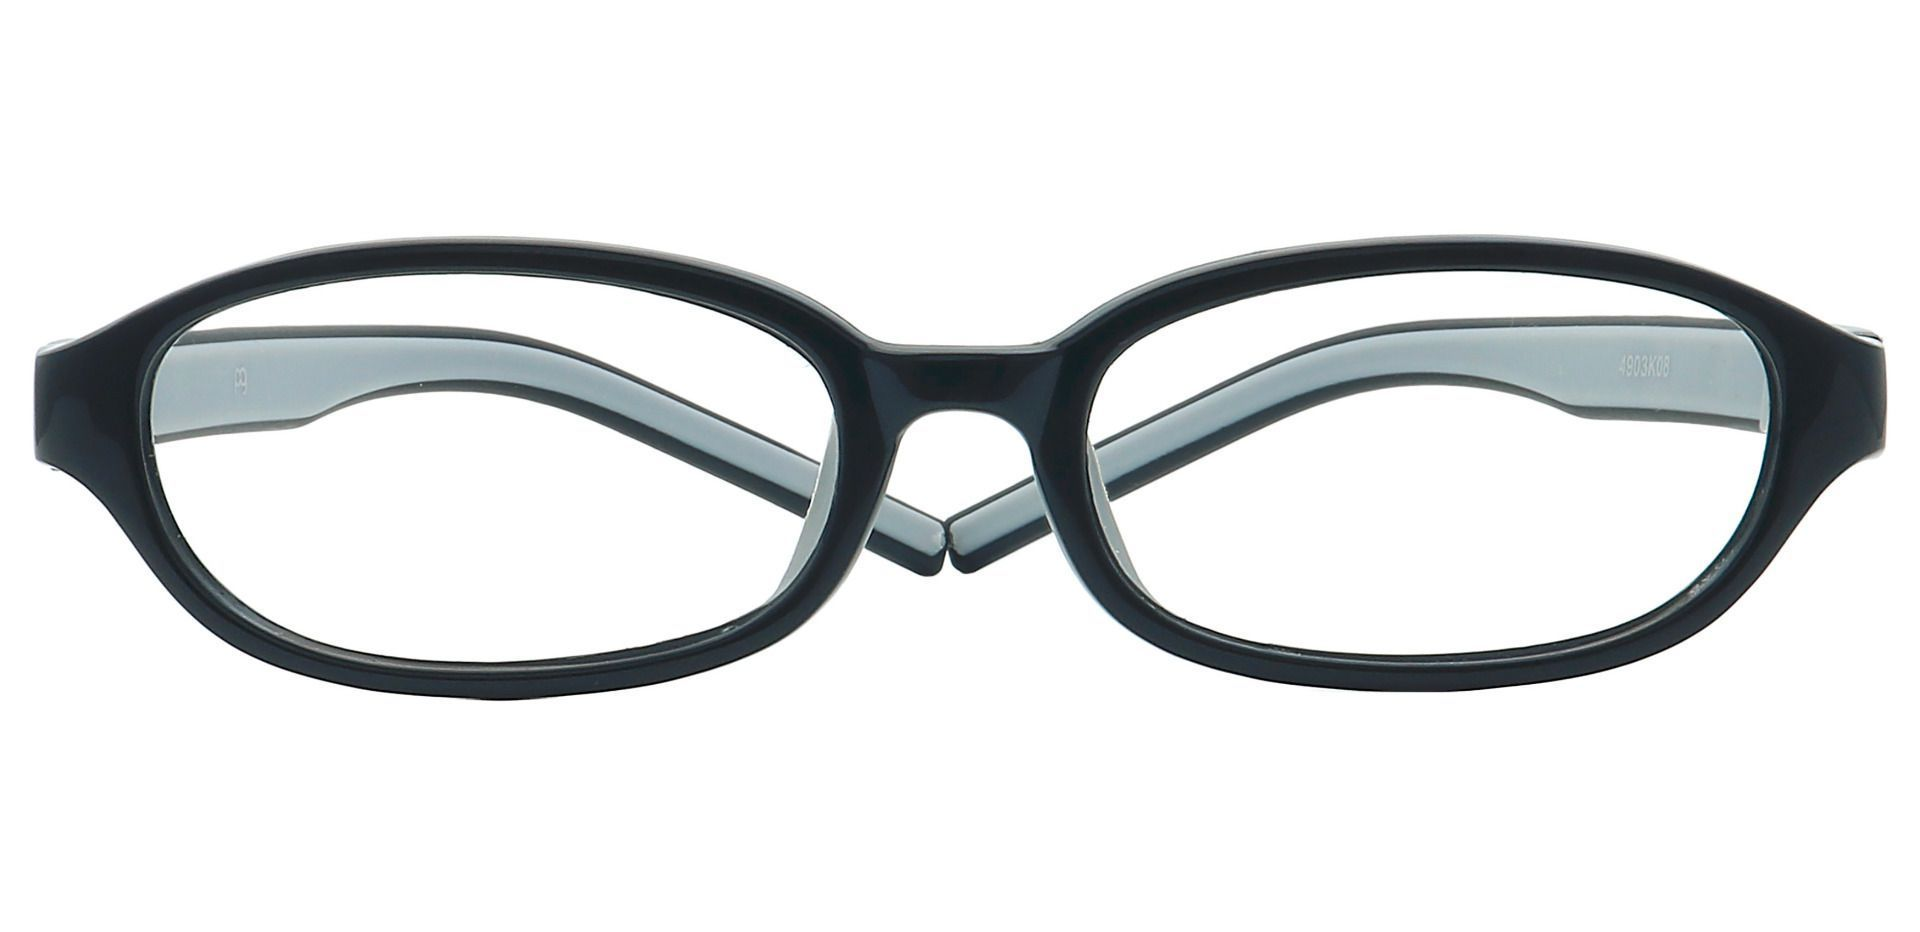 Scoop Oval Single Vision Glasses - Black